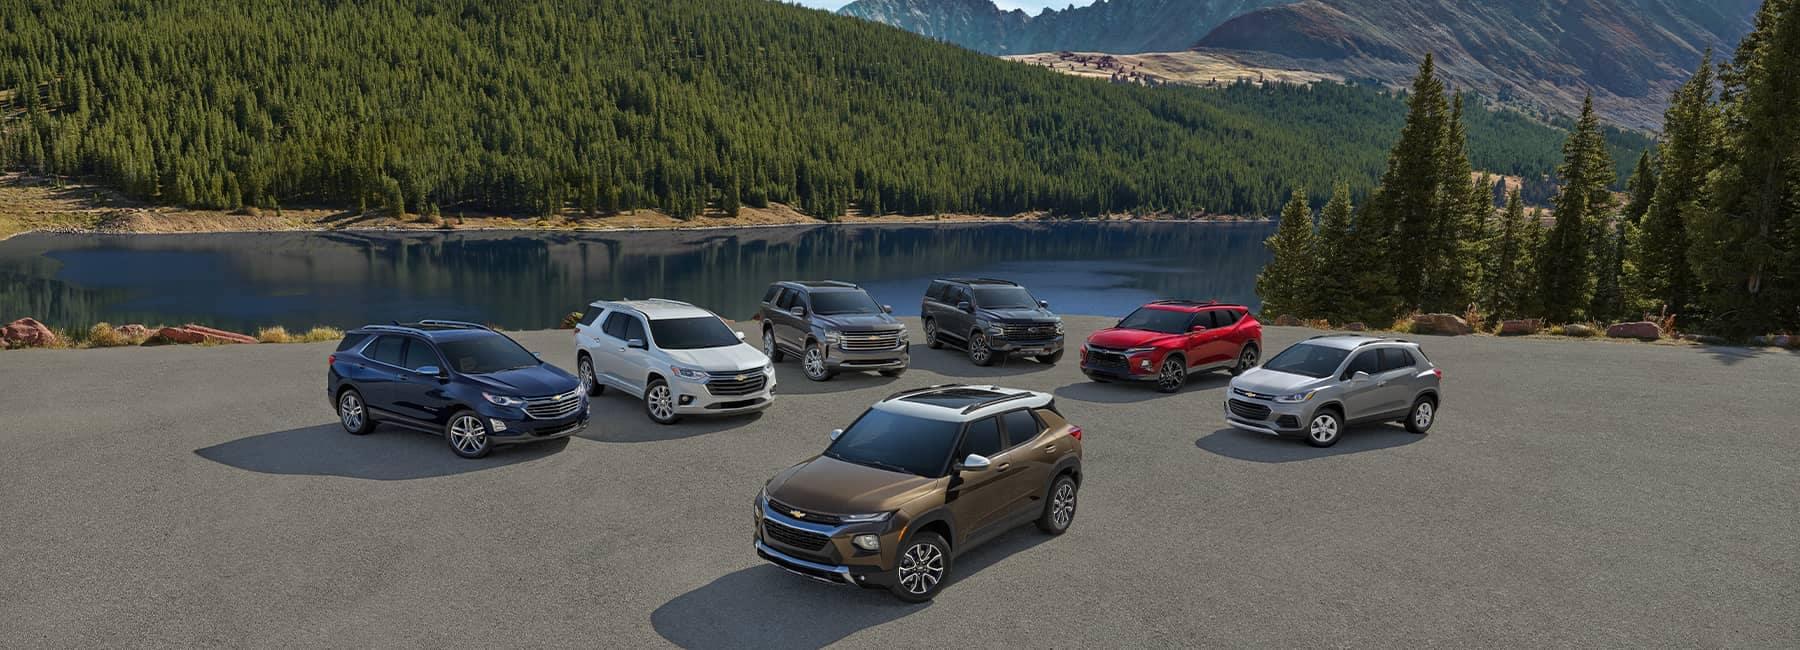 2020 Chevrolet SUV Lineup